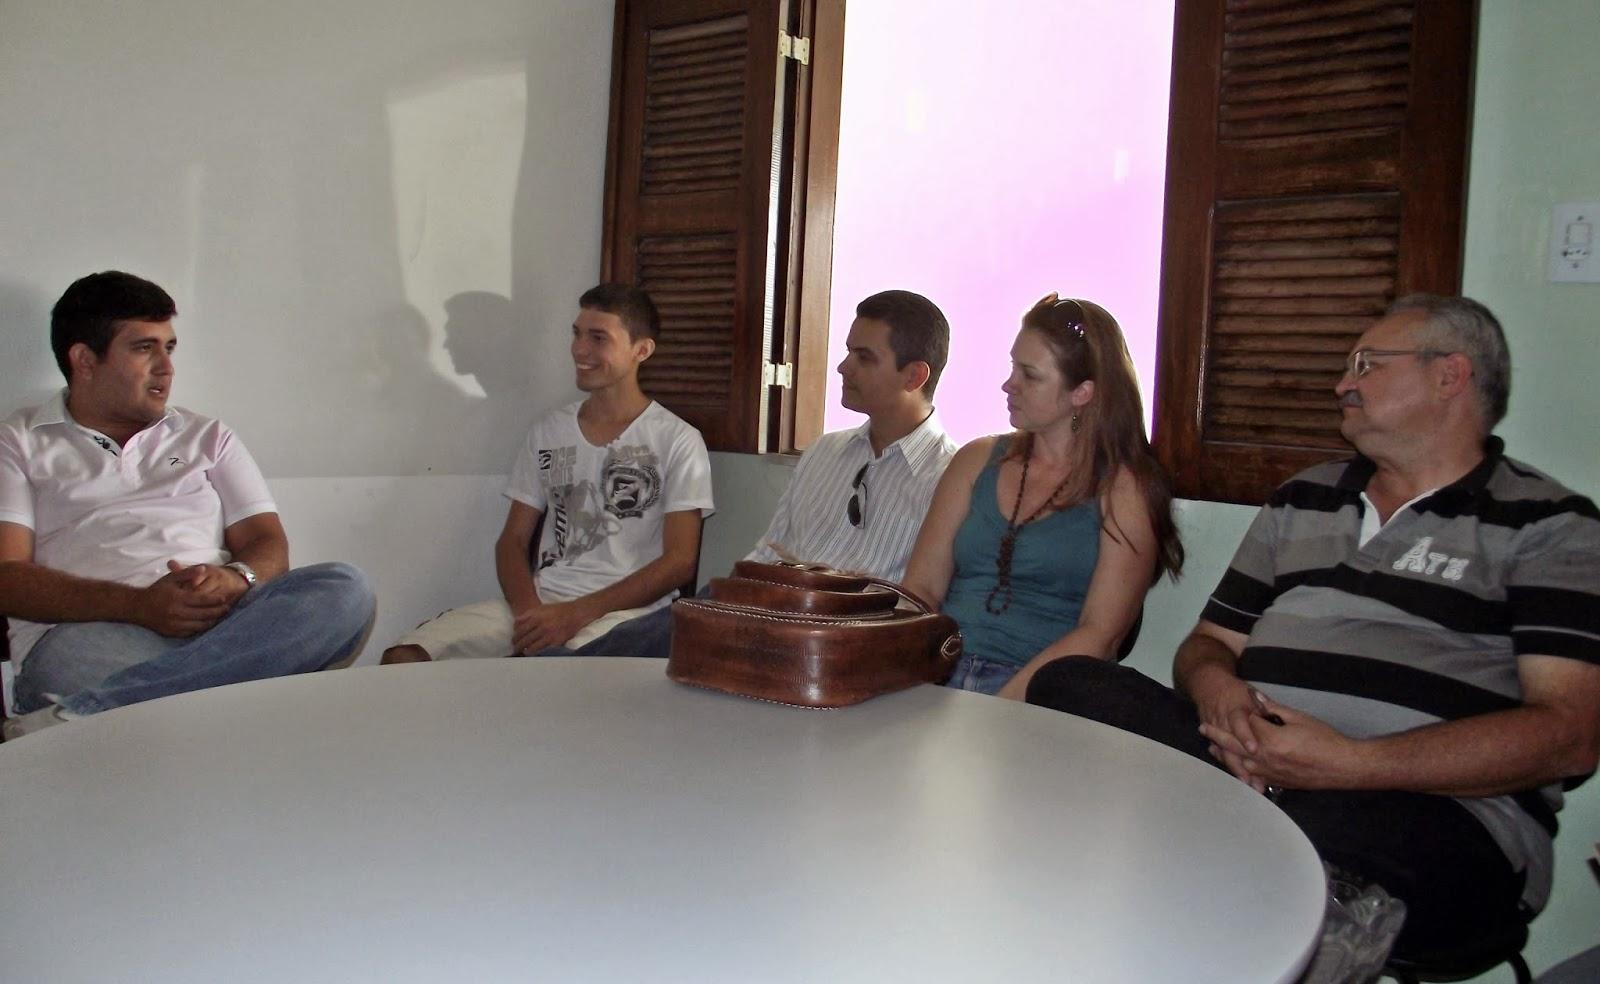 Adel recebe visita da Ashoka e do Instituto Sertão Vivo – ADEL